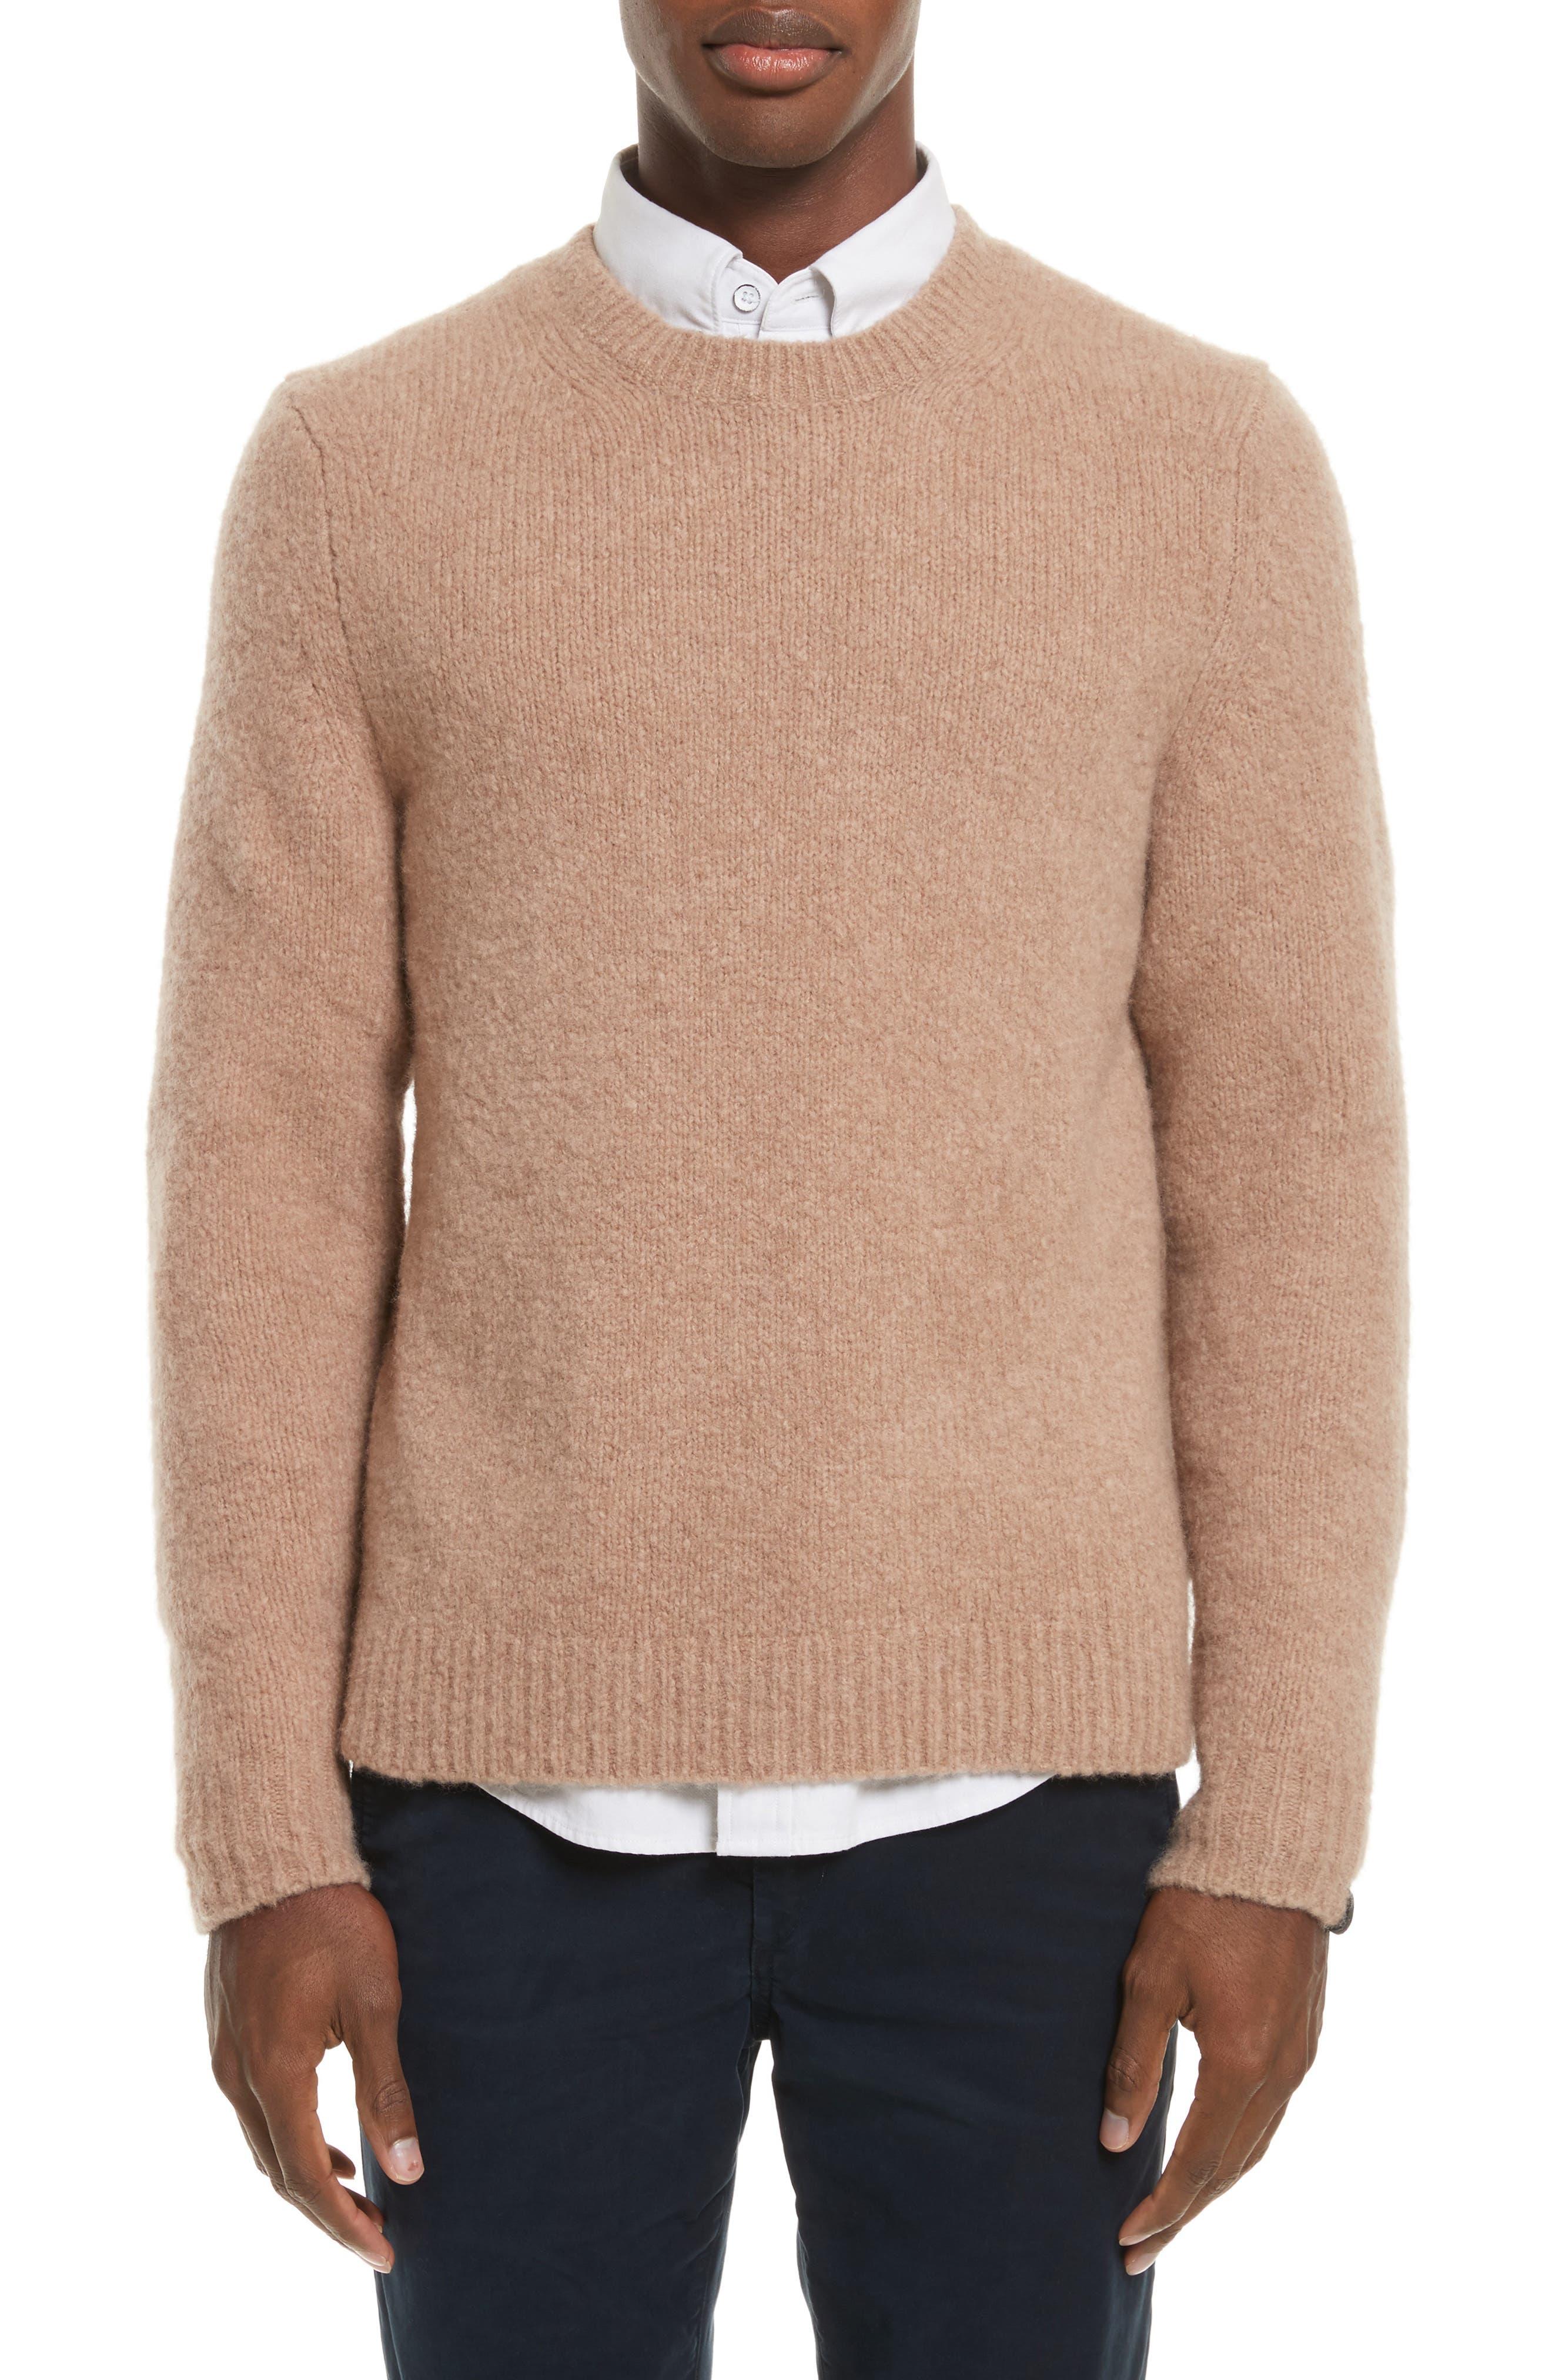 Charles Merino Wool Blend Sweater,                         Main,                         color, 230